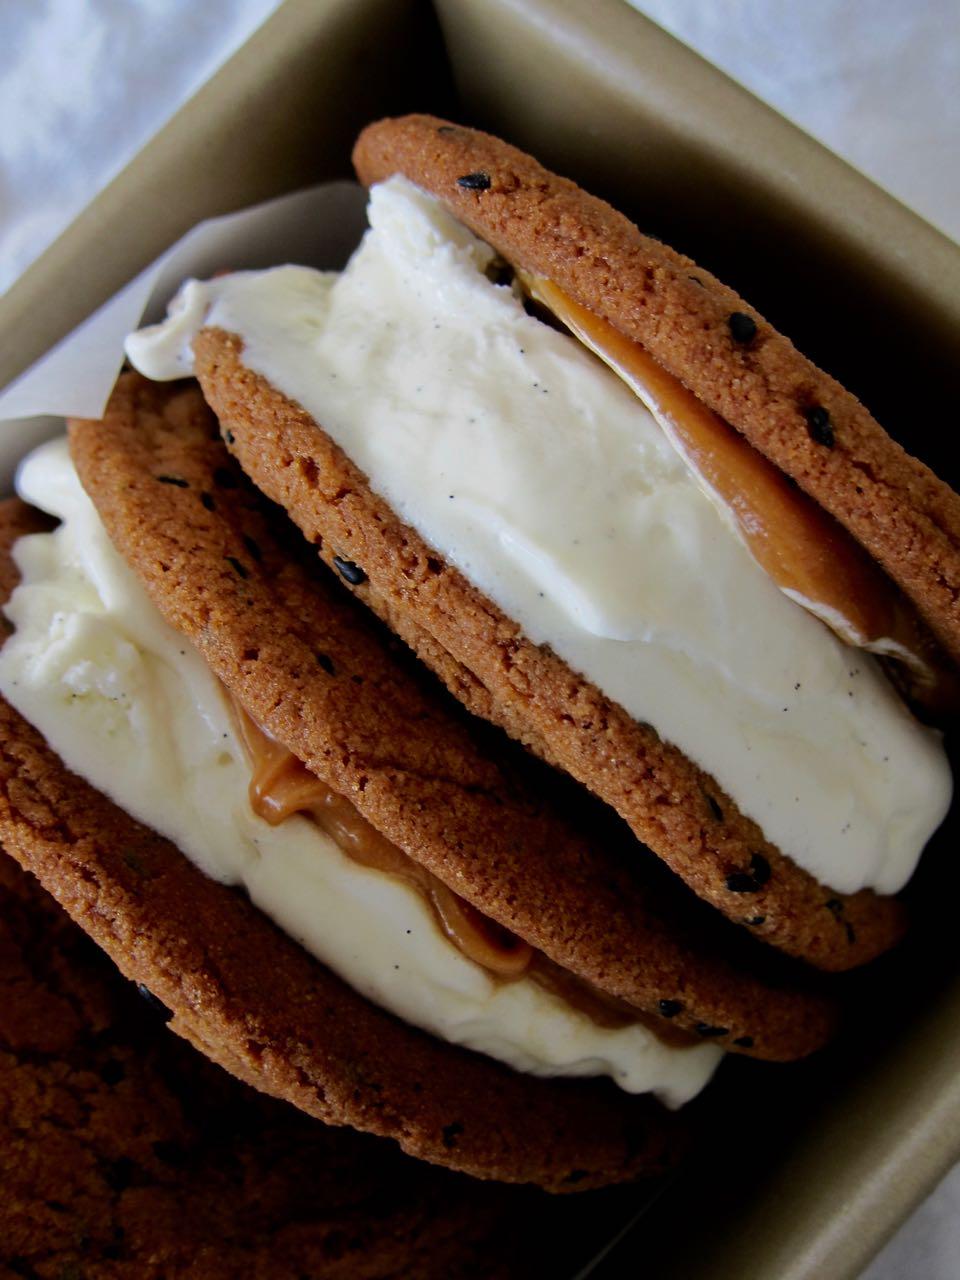 Black Sesame & Vanilla Ice Cream Sandwiches